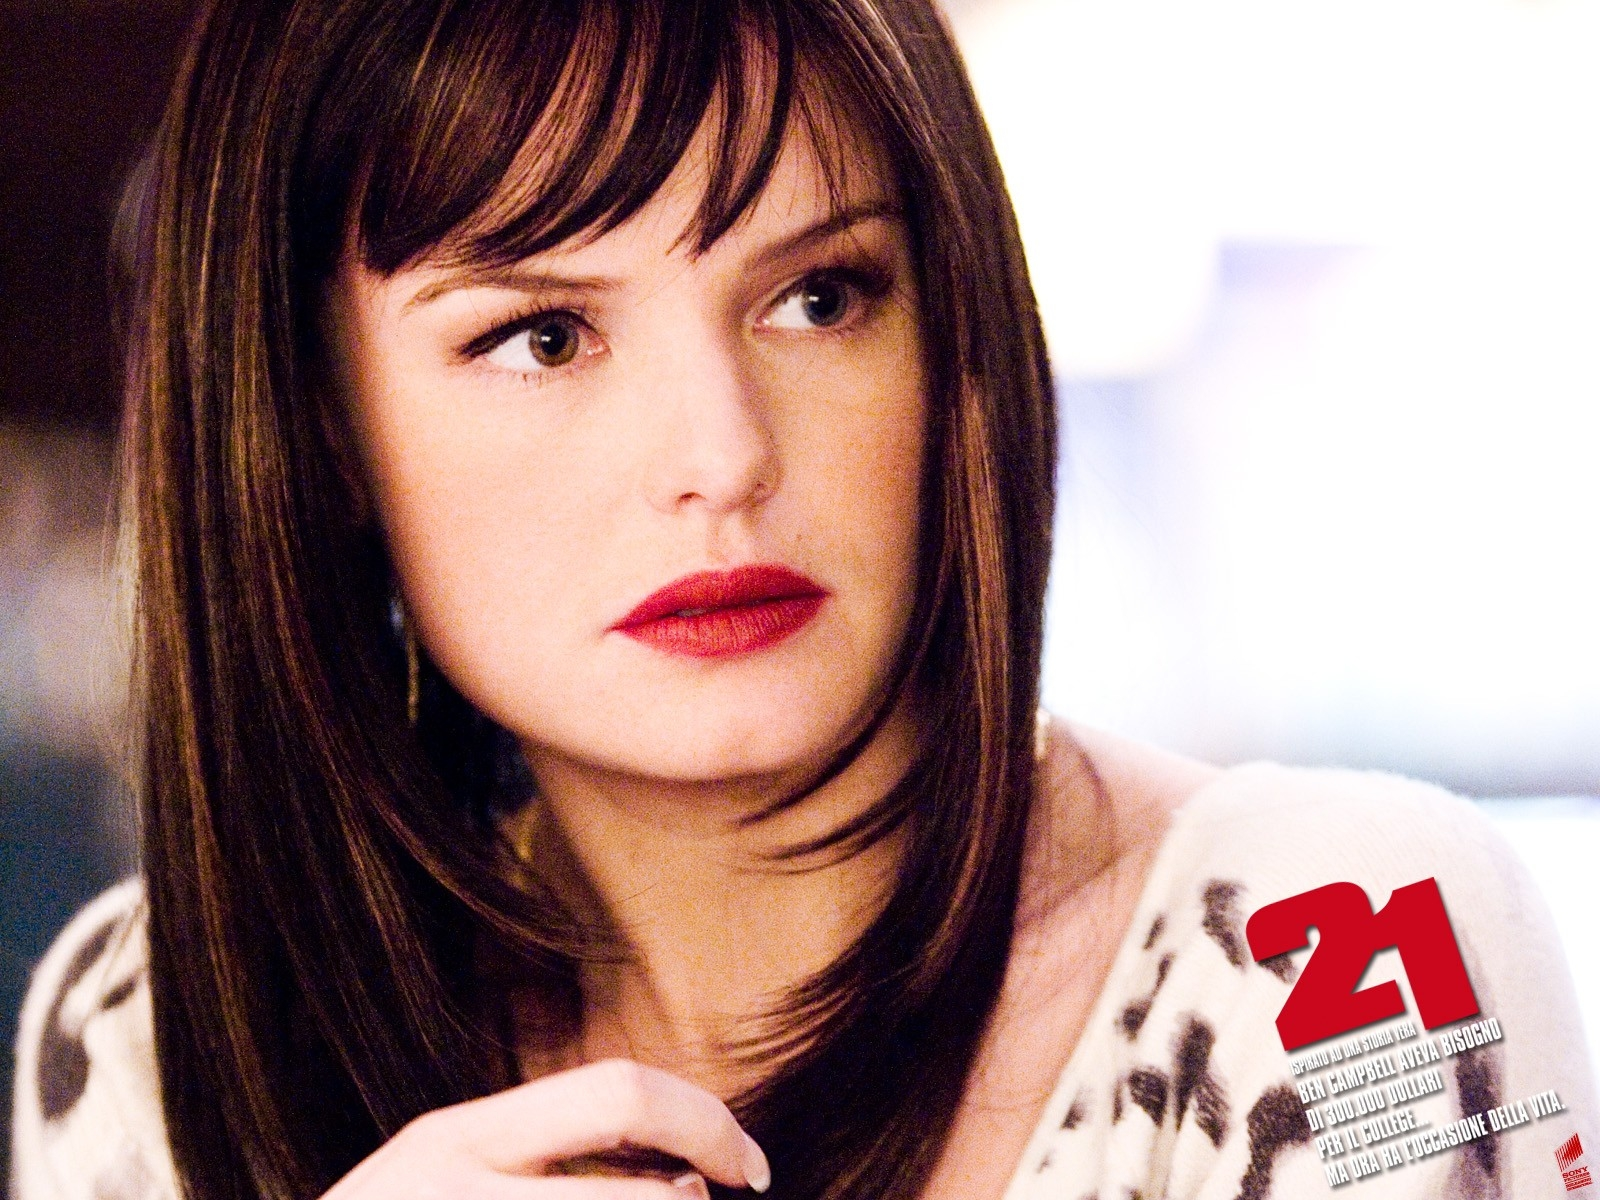 Wallpaper del film 21 - Kate Bosworth